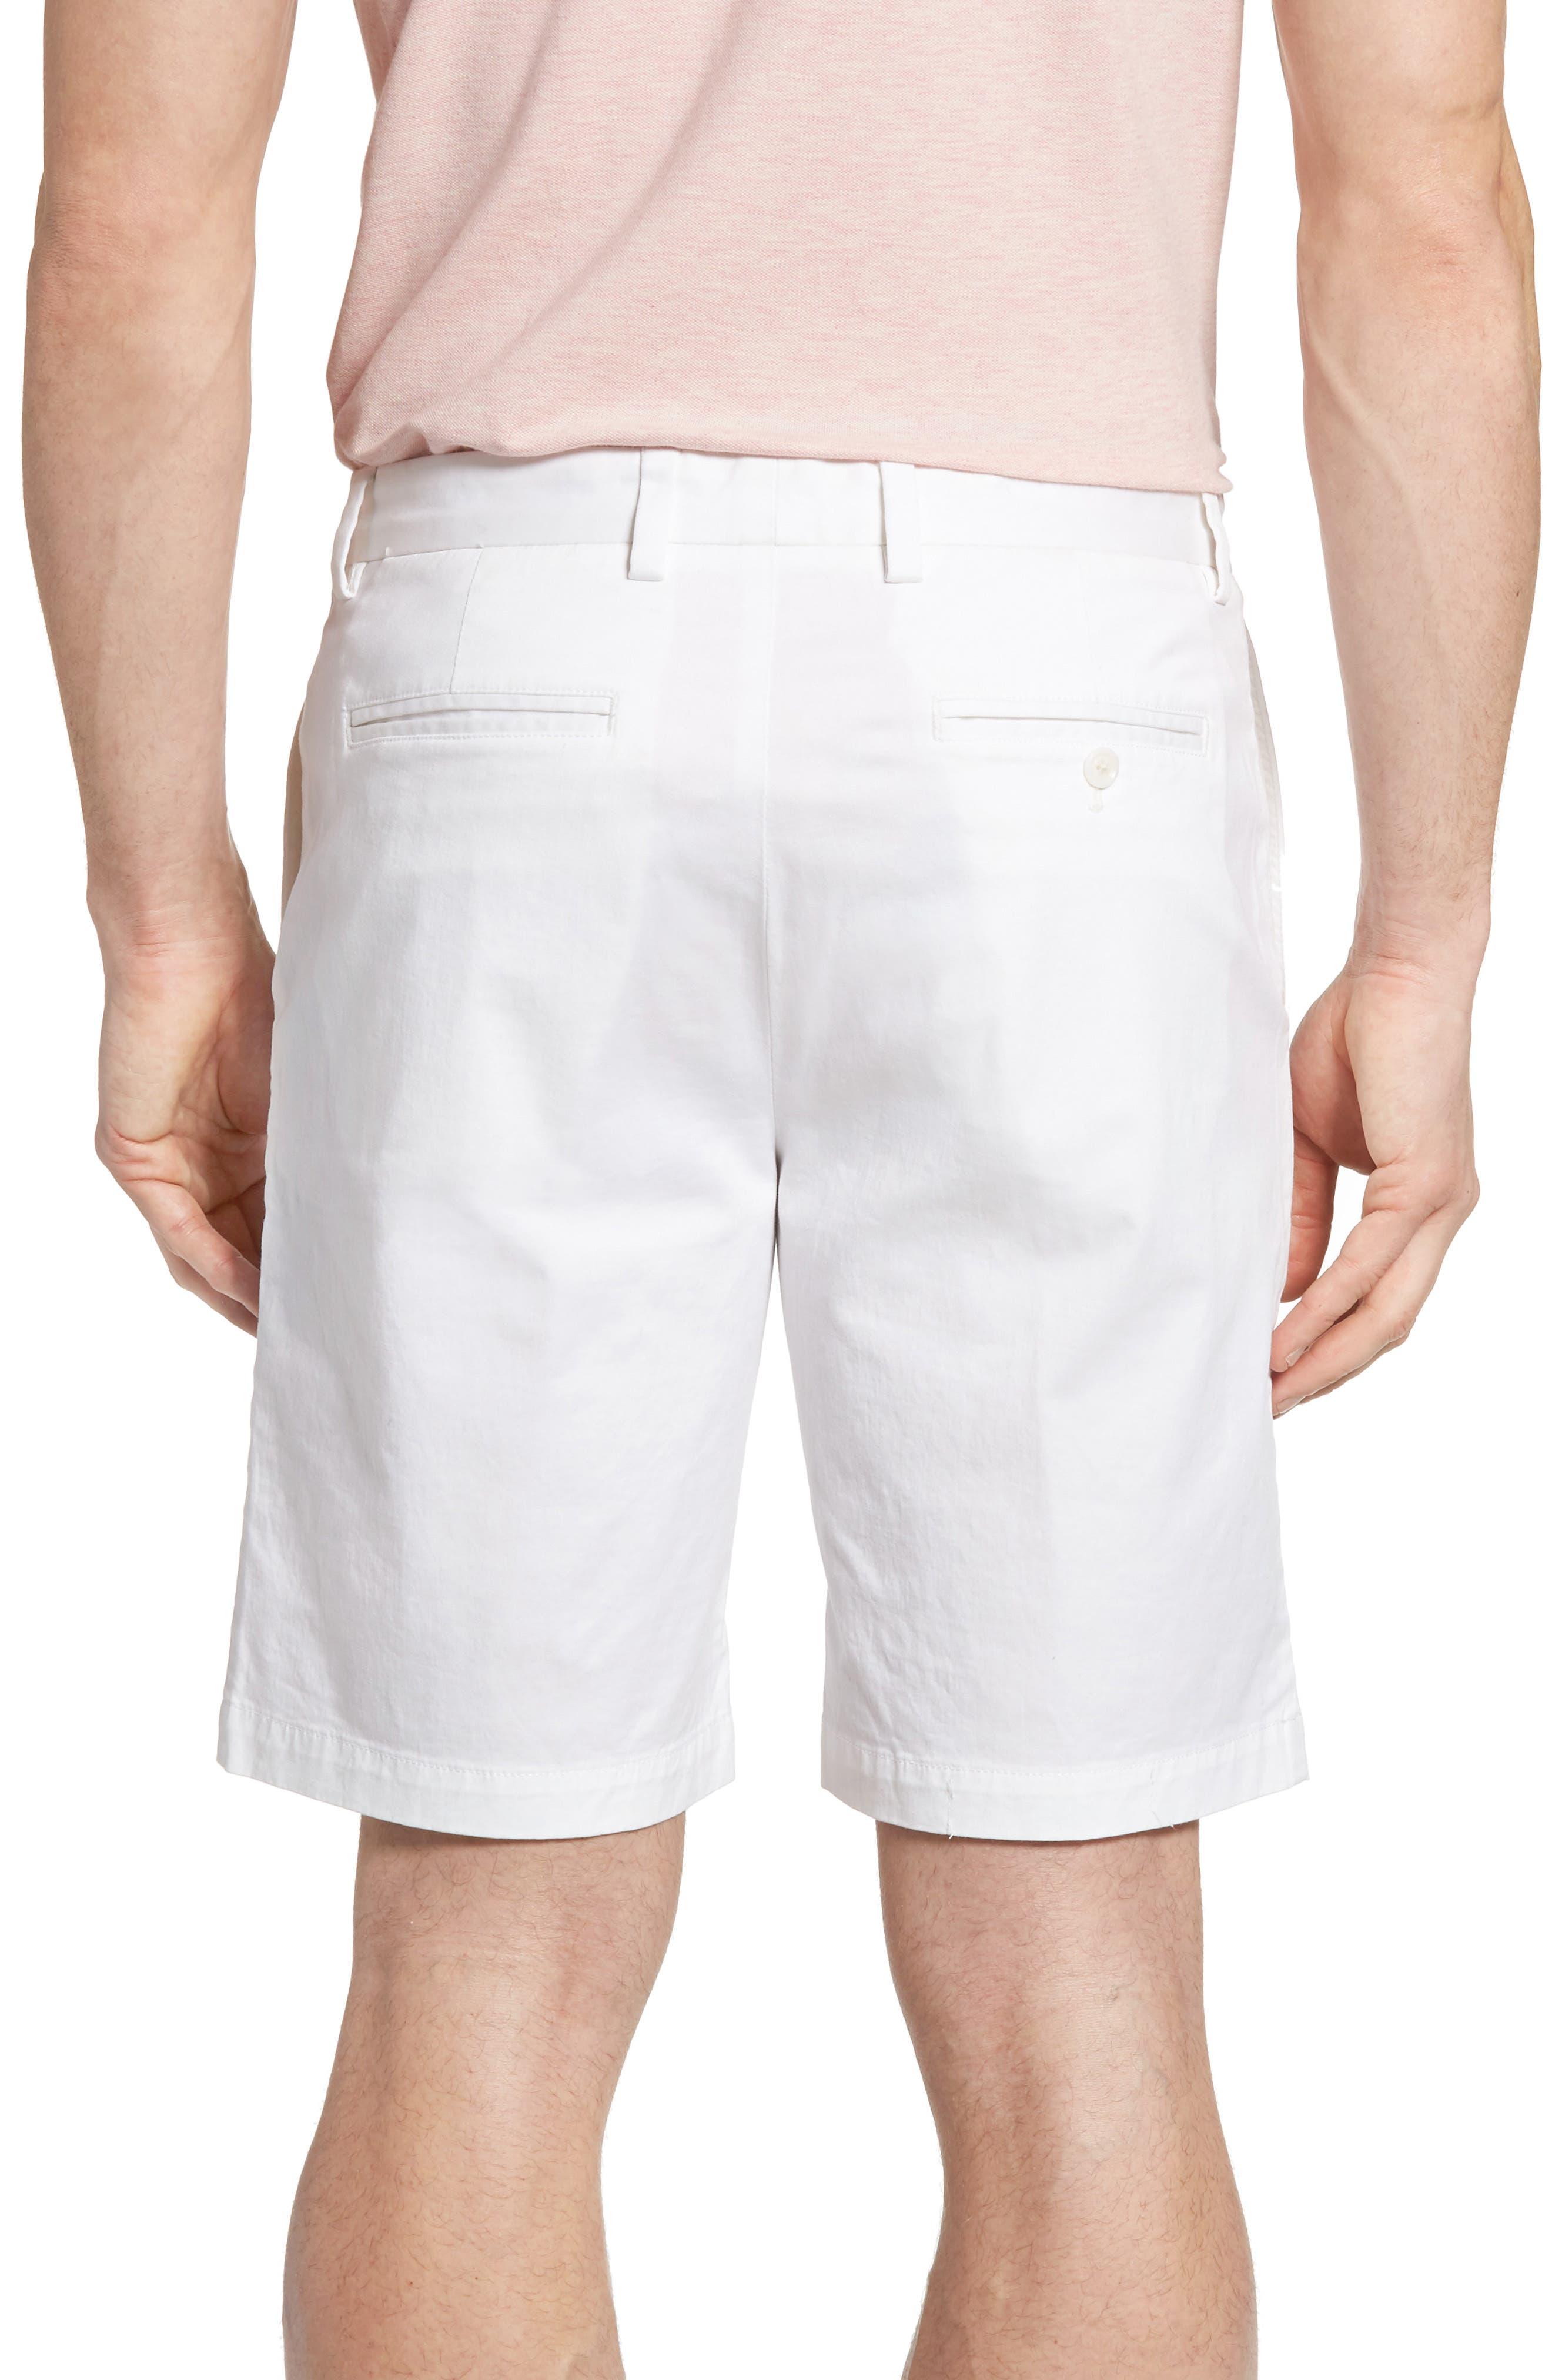 9 Inch Stretch Breaker Shorts,                             Alternate thumbnail 35, color,